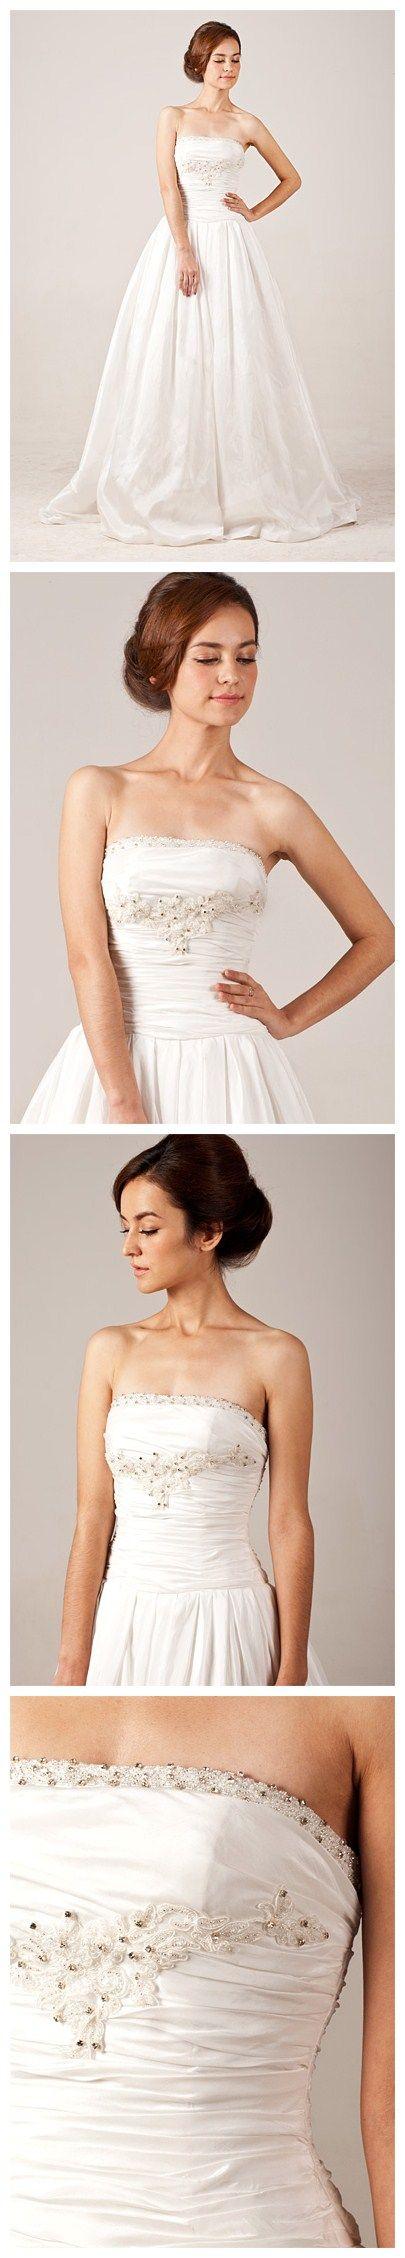 Elegant Strapless Taffeta Ruffle Beading Wedding Dress